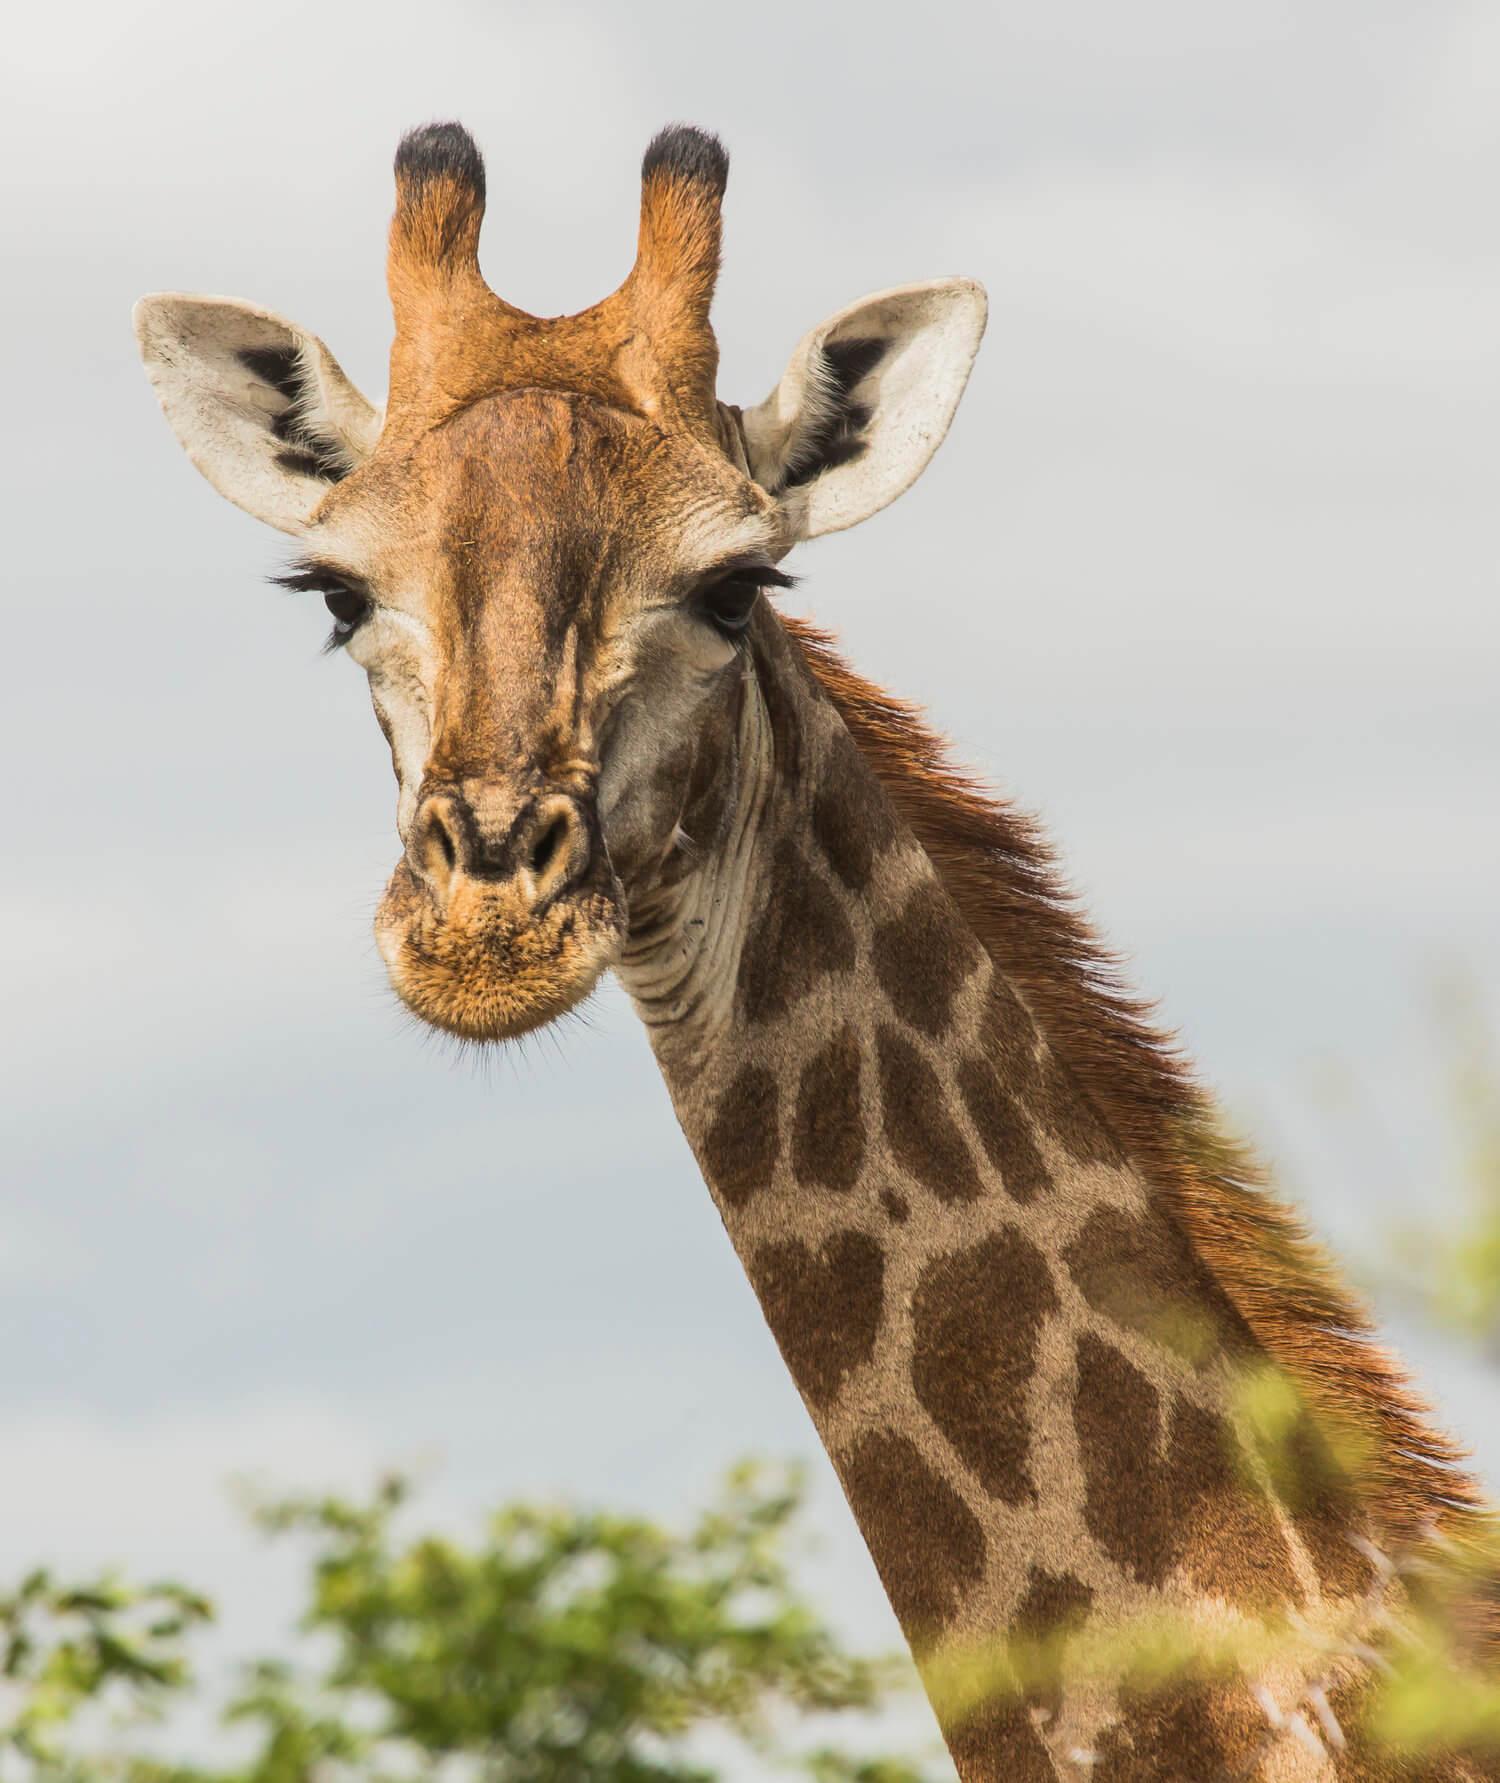 Five Giant Giraffe Facts